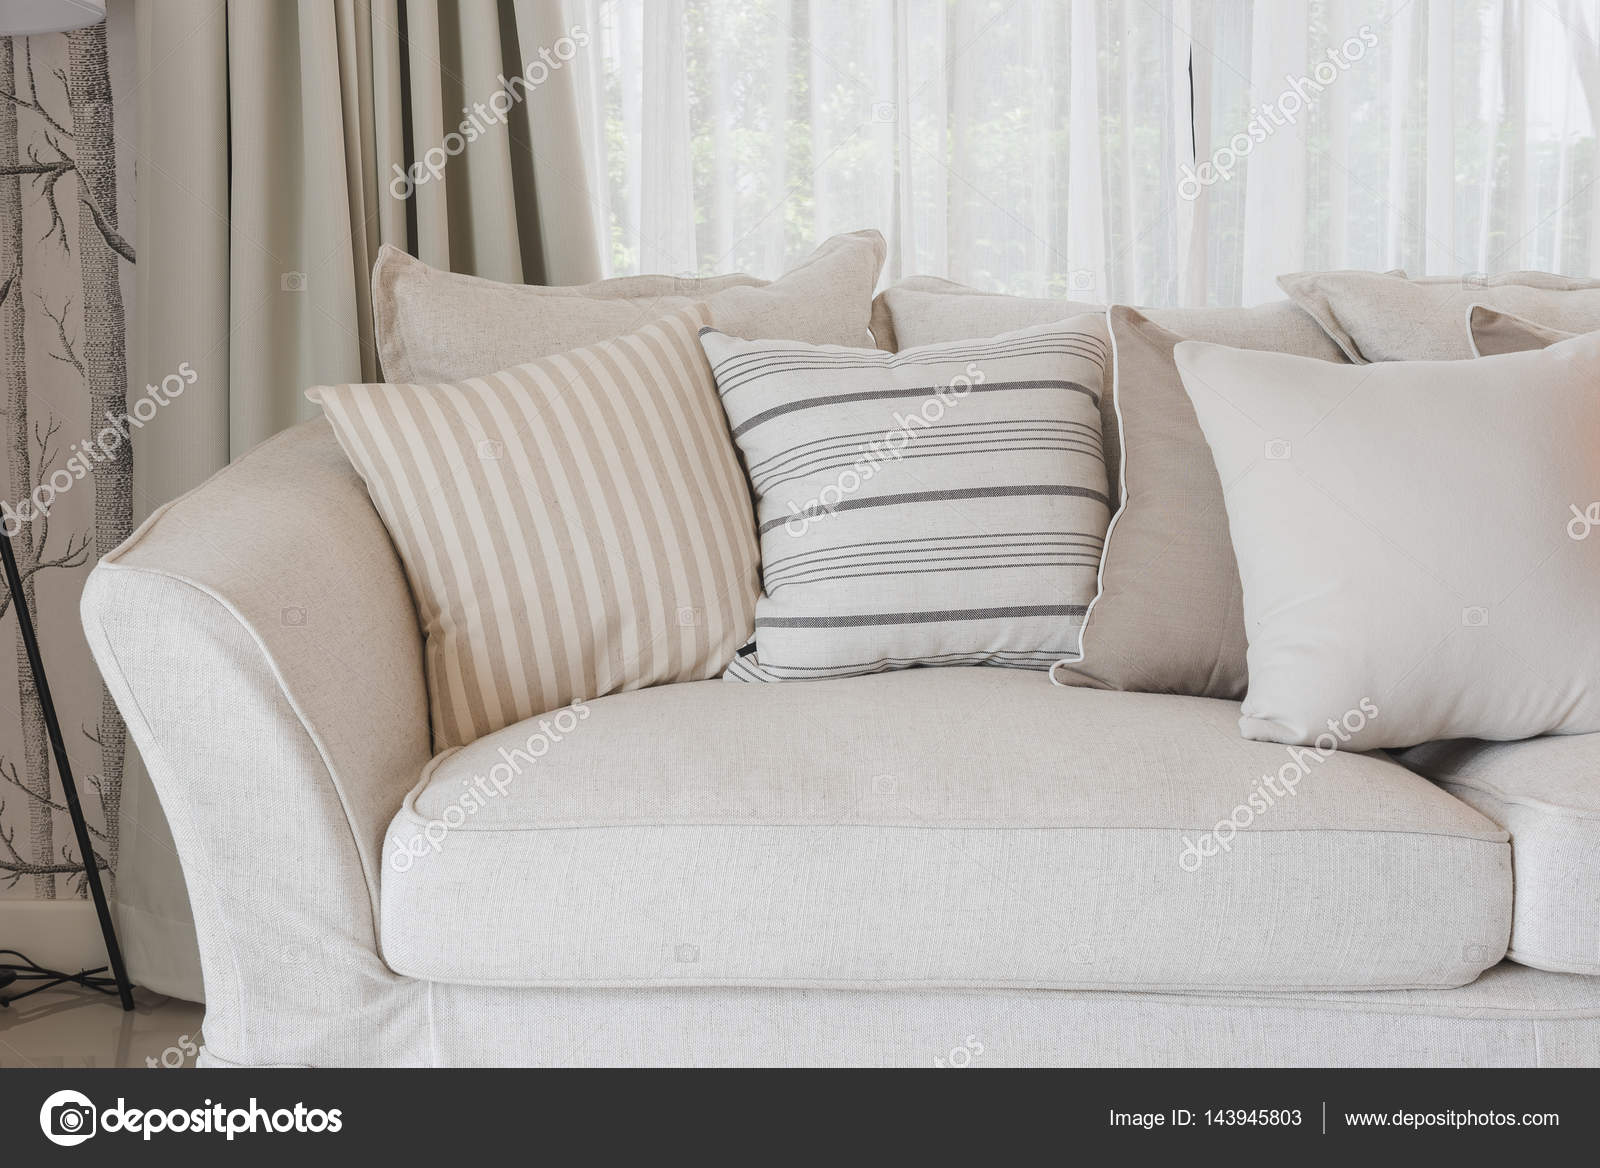 canape classique gallery of canap classique with canape classique great tt canap classique de. Black Bedroom Furniture Sets. Home Design Ideas